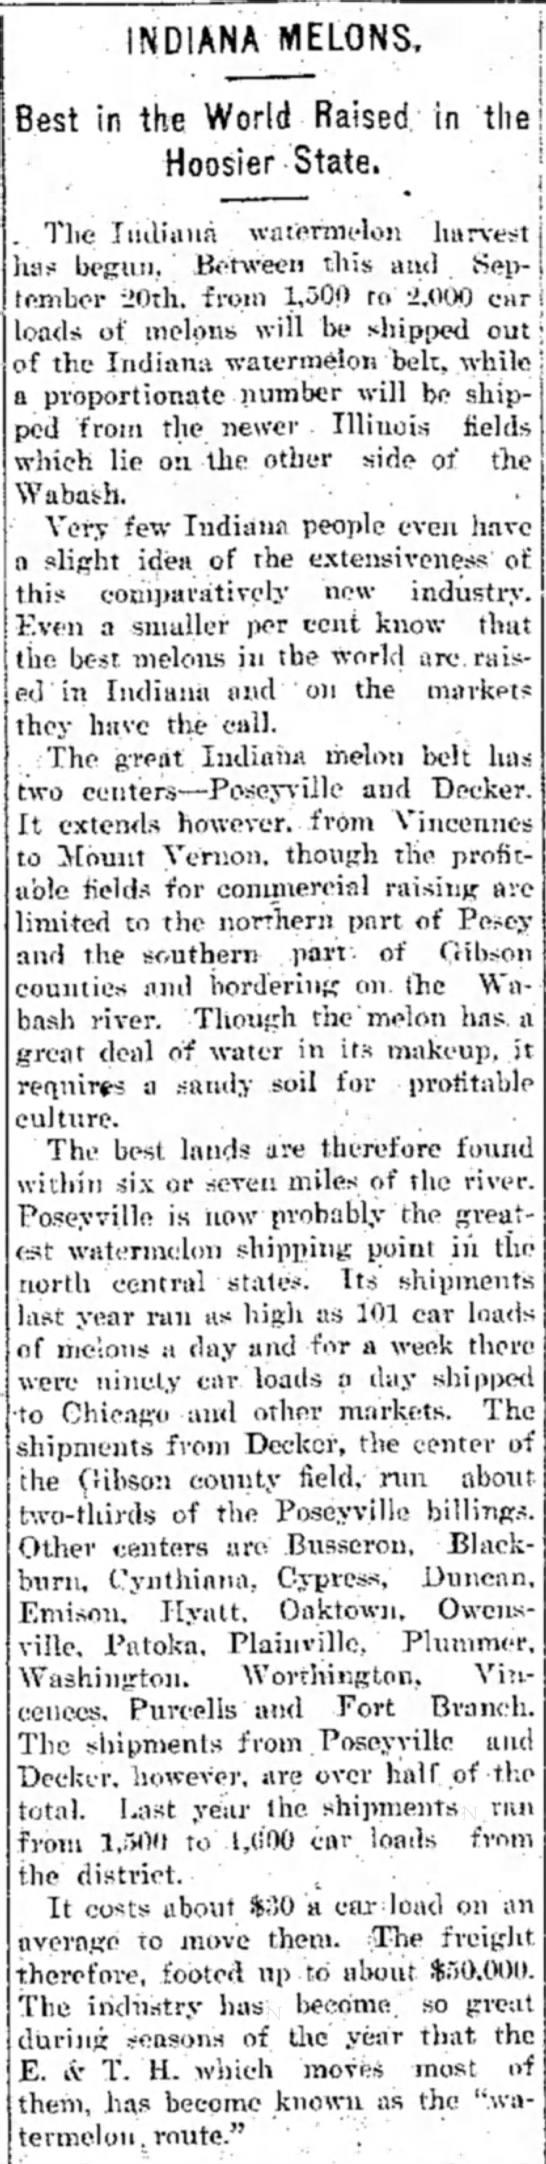 Poseyville Decker Watermelons -